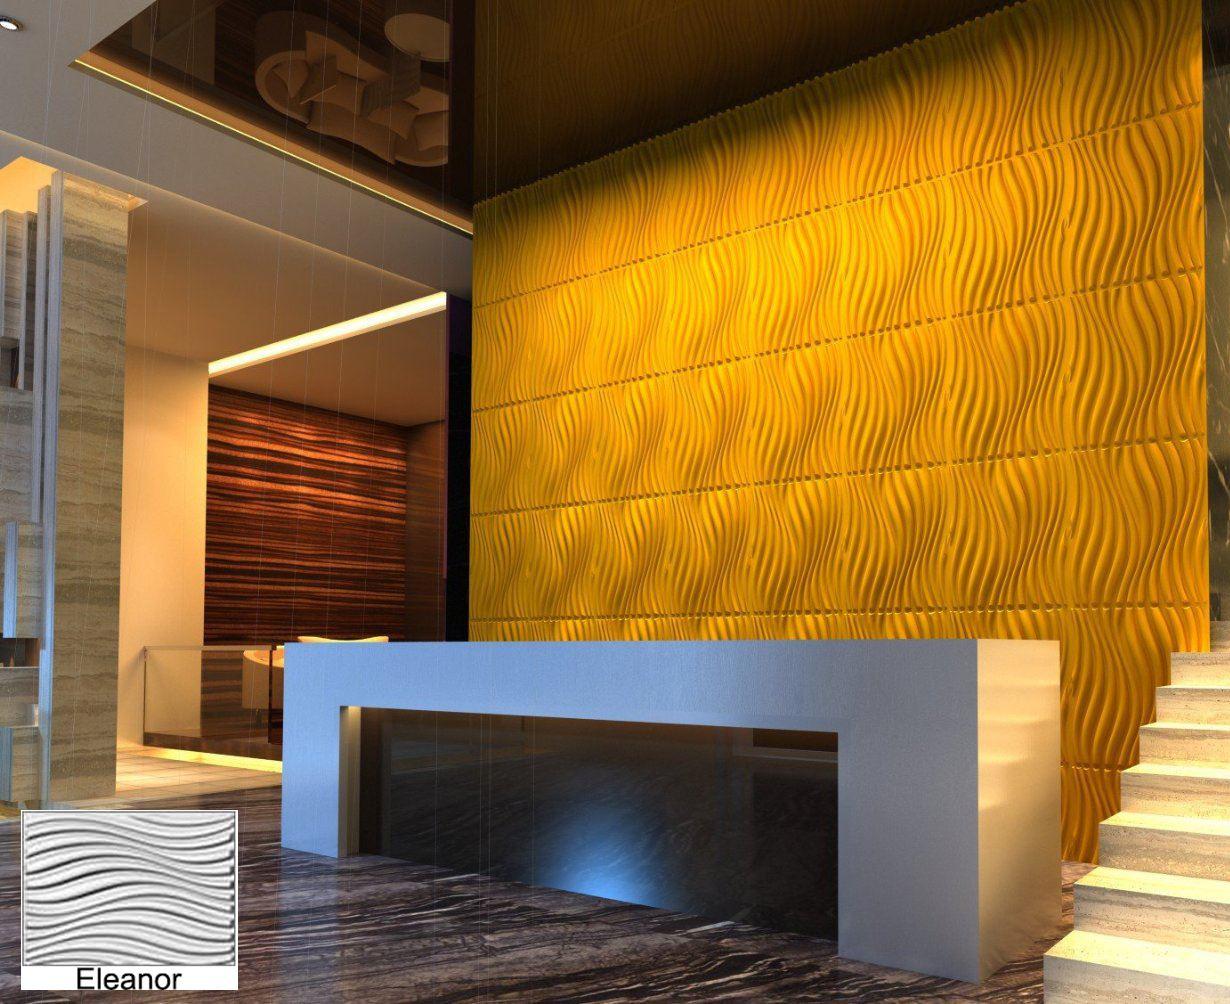 bambus 3d wandpaneel dekorativen wandverkleidung decke fliesen tapete ebay. Black Bedroom Furniture Sets. Home Design Ideas